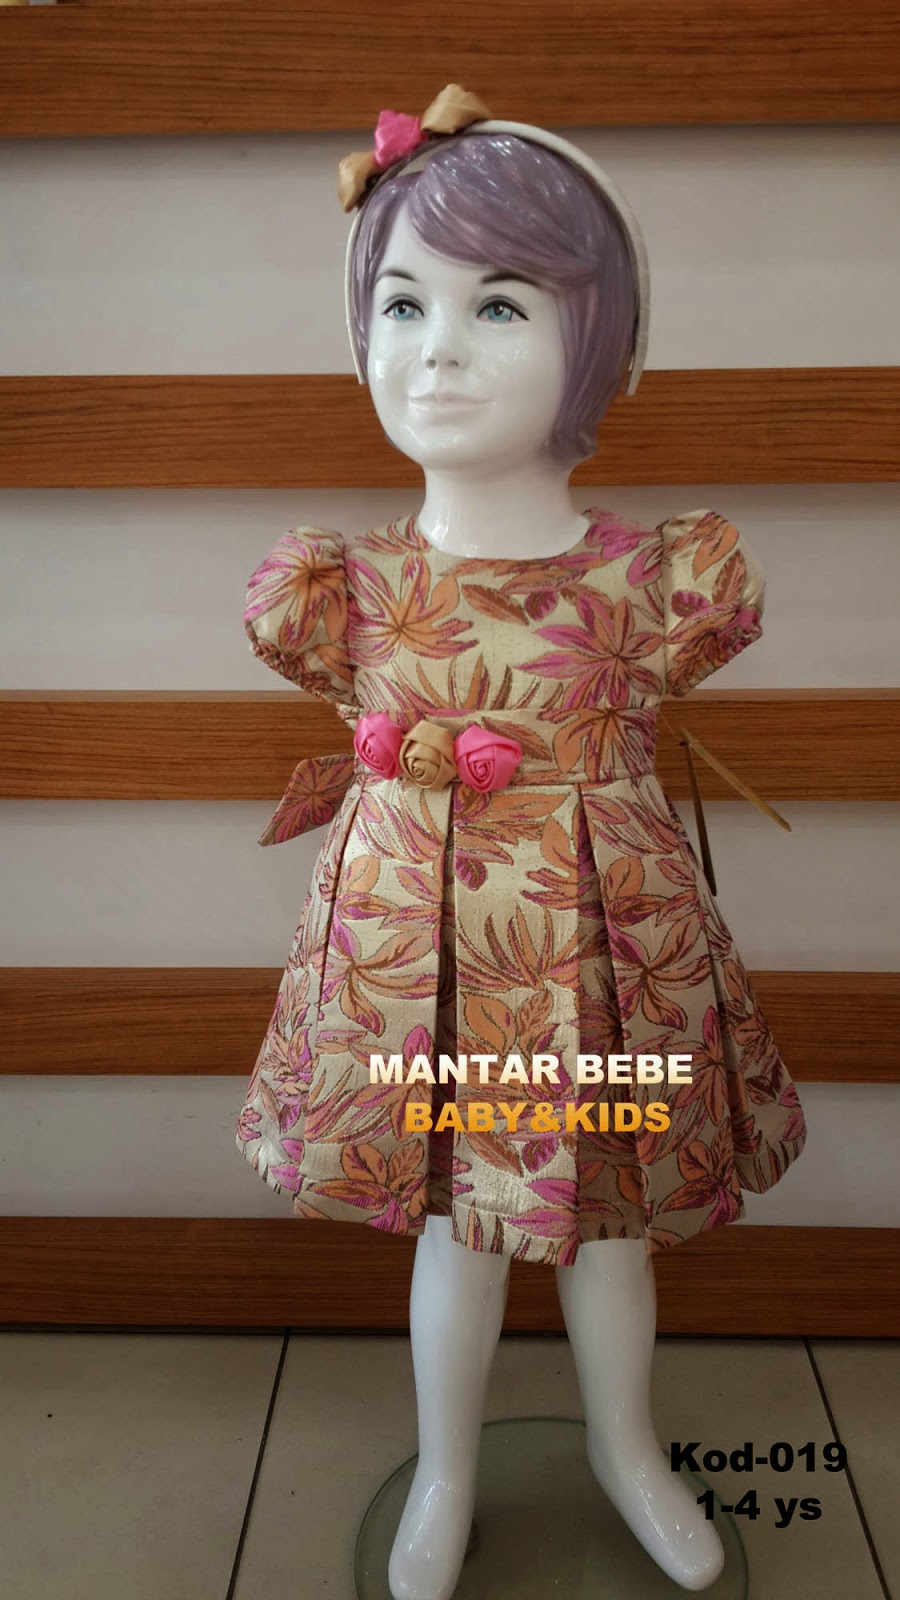 MANTAR BEBE ÇOCUK GİYİM - KOD019